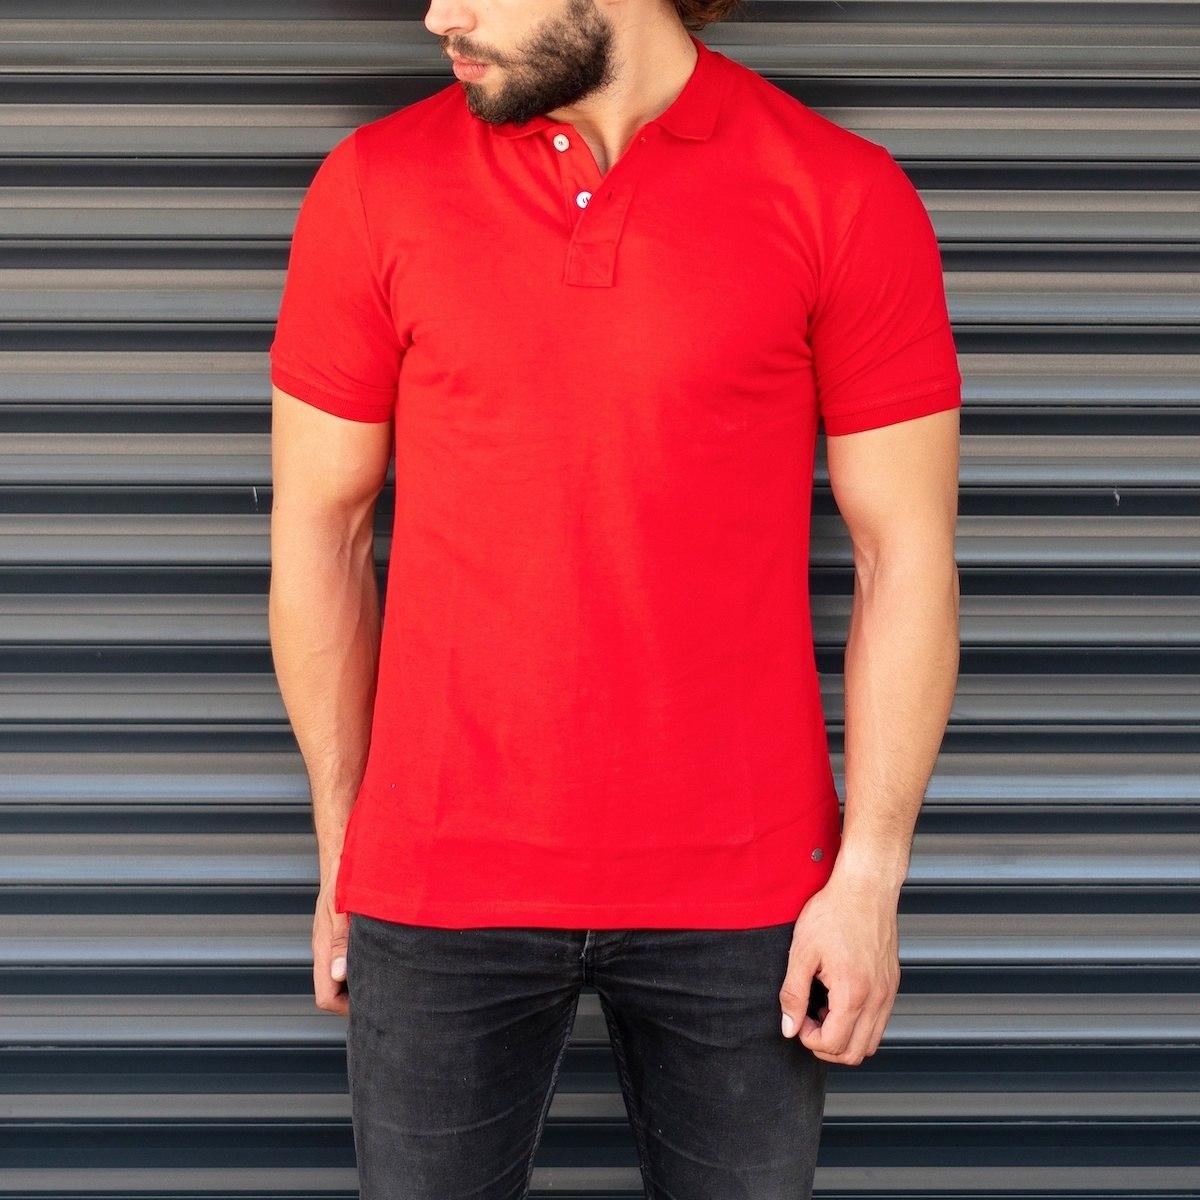 Herren Slim-Fit Polo Shirt mit langem Schnitt in rot